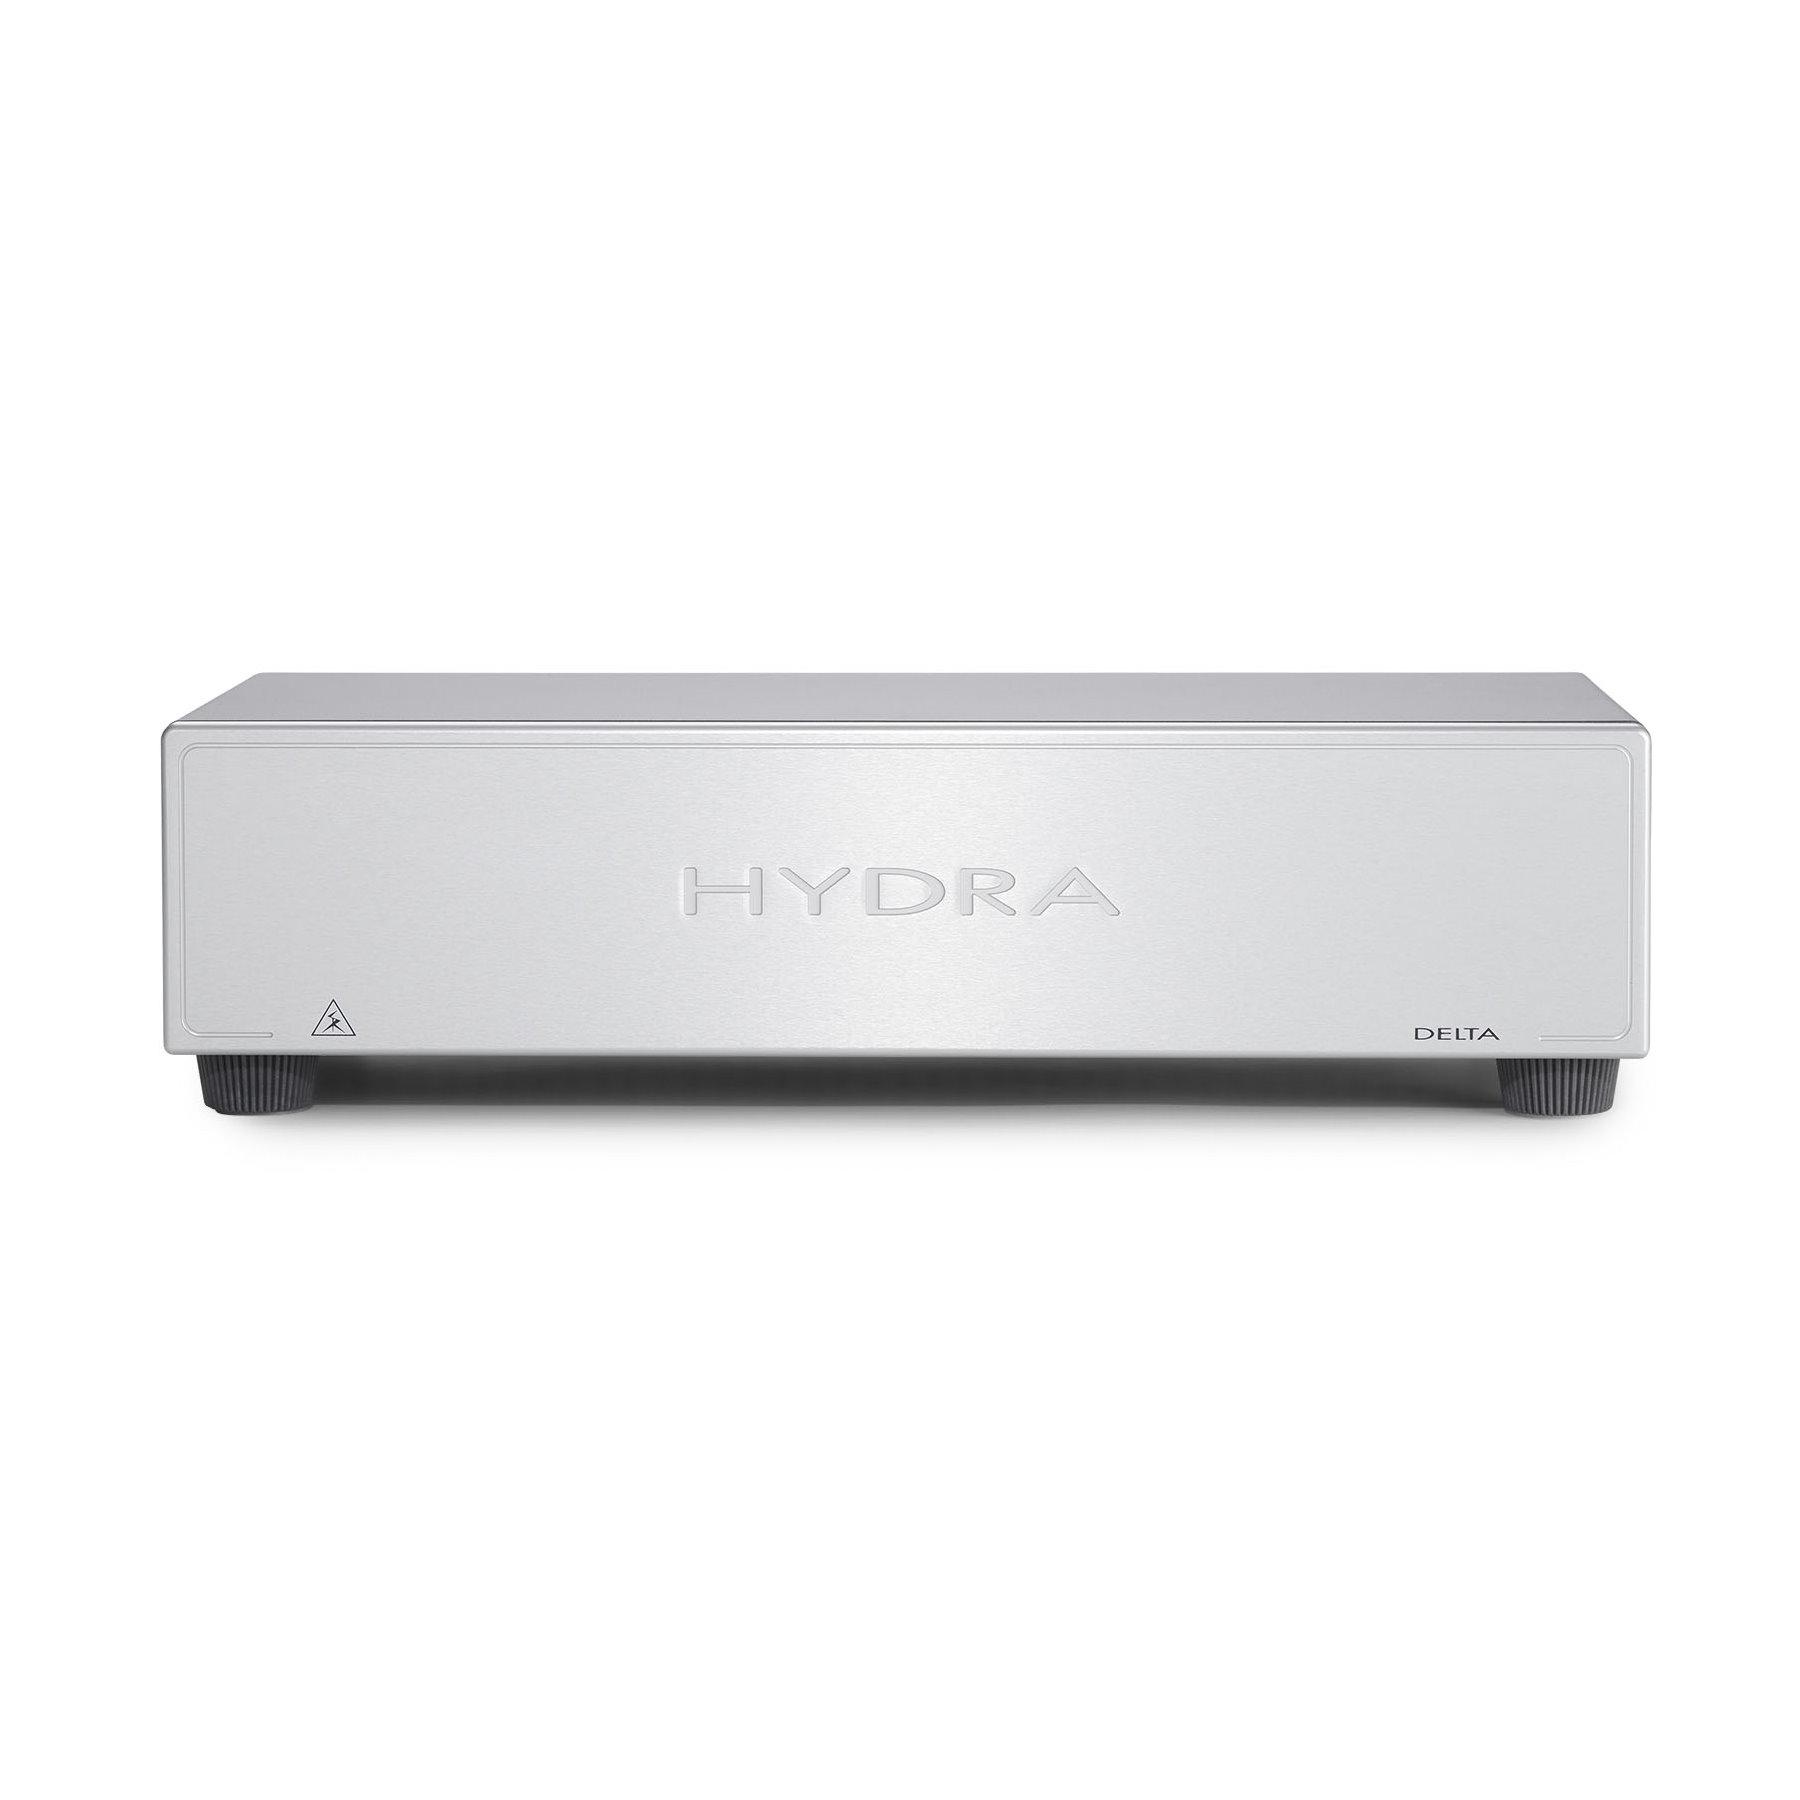 Shunyata Hydra Delta 6 Powerline Conditioner